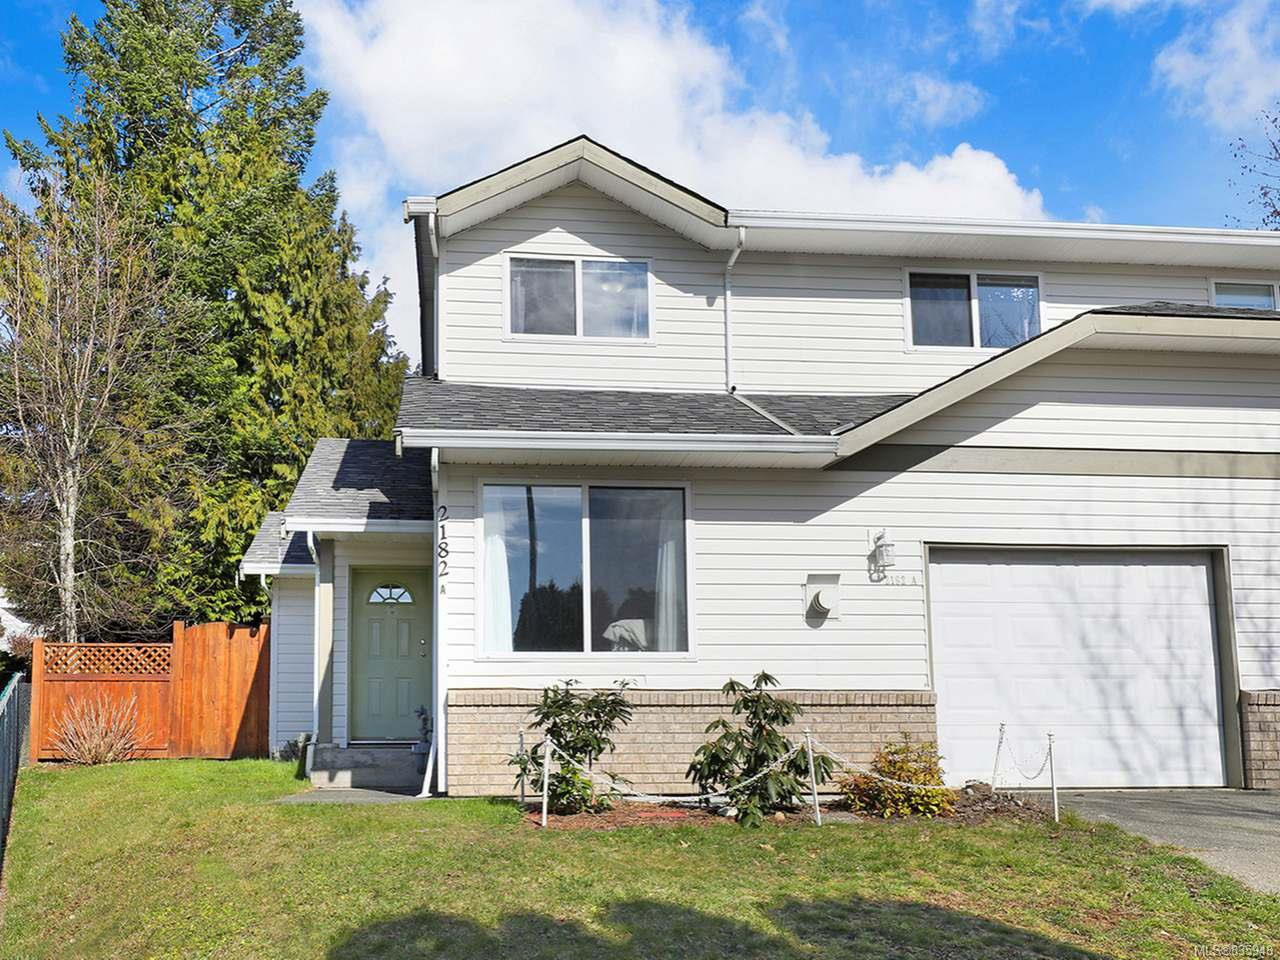 Main Photo: a 2182 Anna Pl in COURTENAY: CV Courtenay East Half Duplex for sale (Comox Valley)  : MLS®# 835948